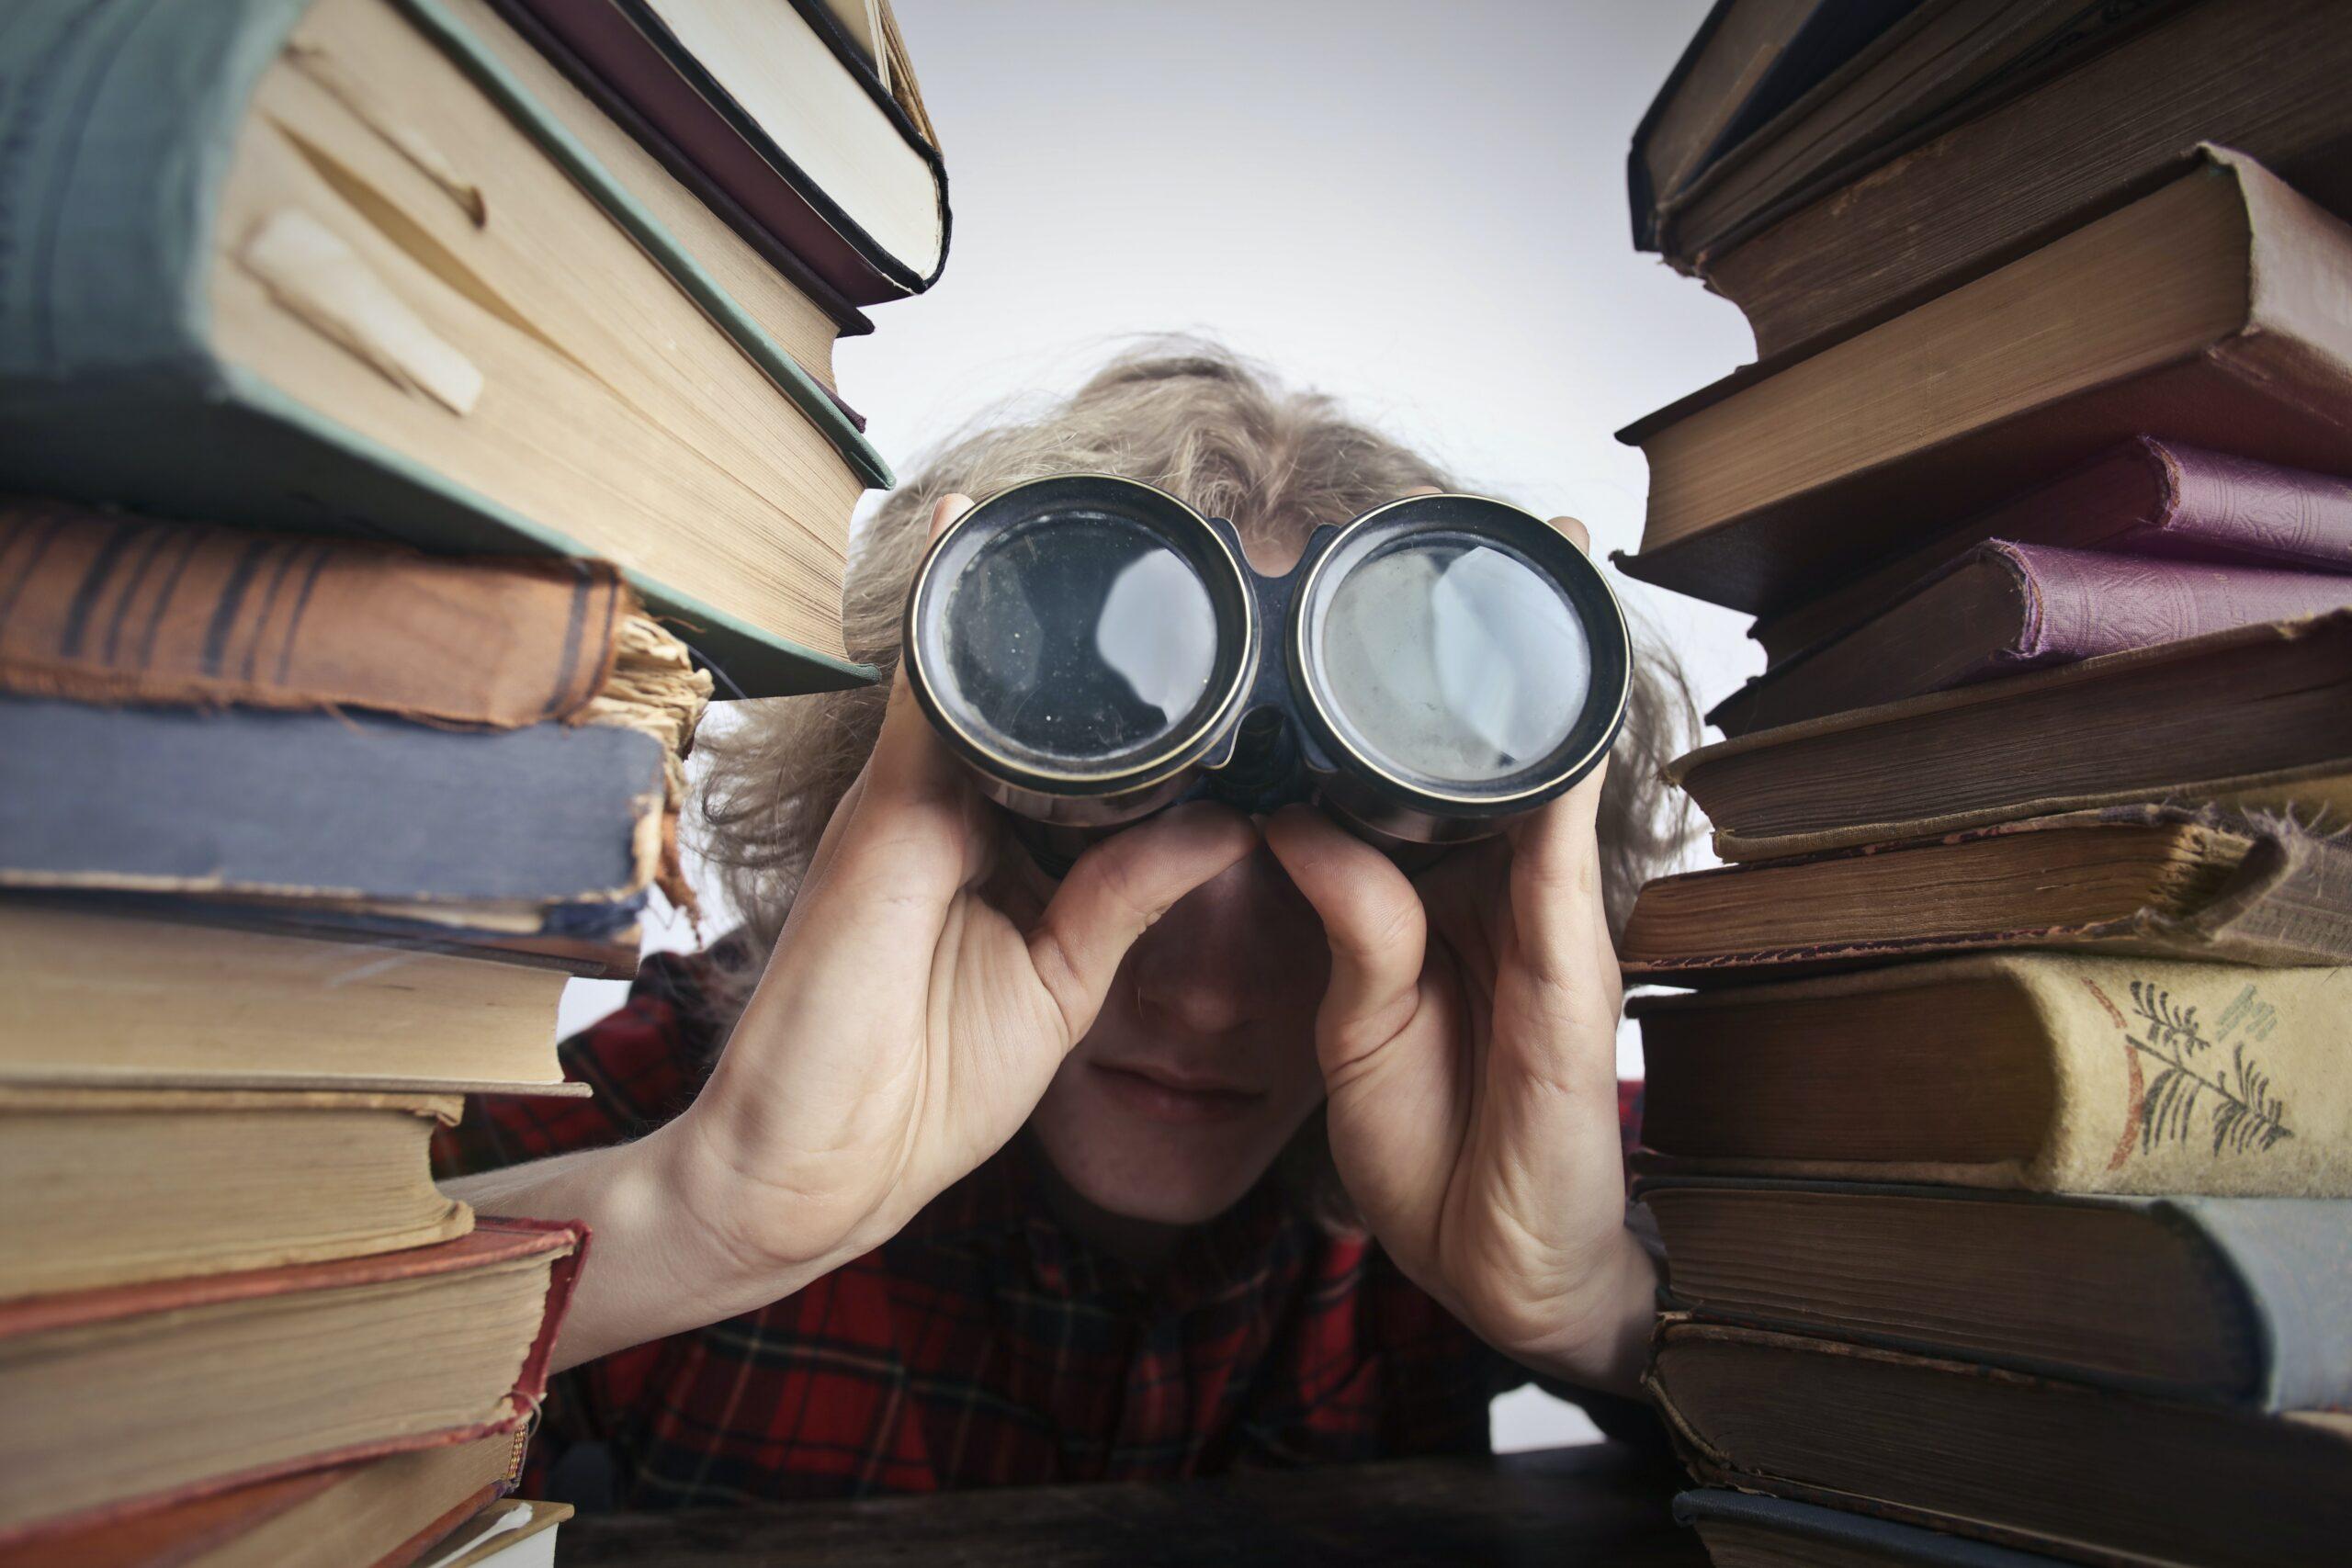 Peeking Through Towers Of Books